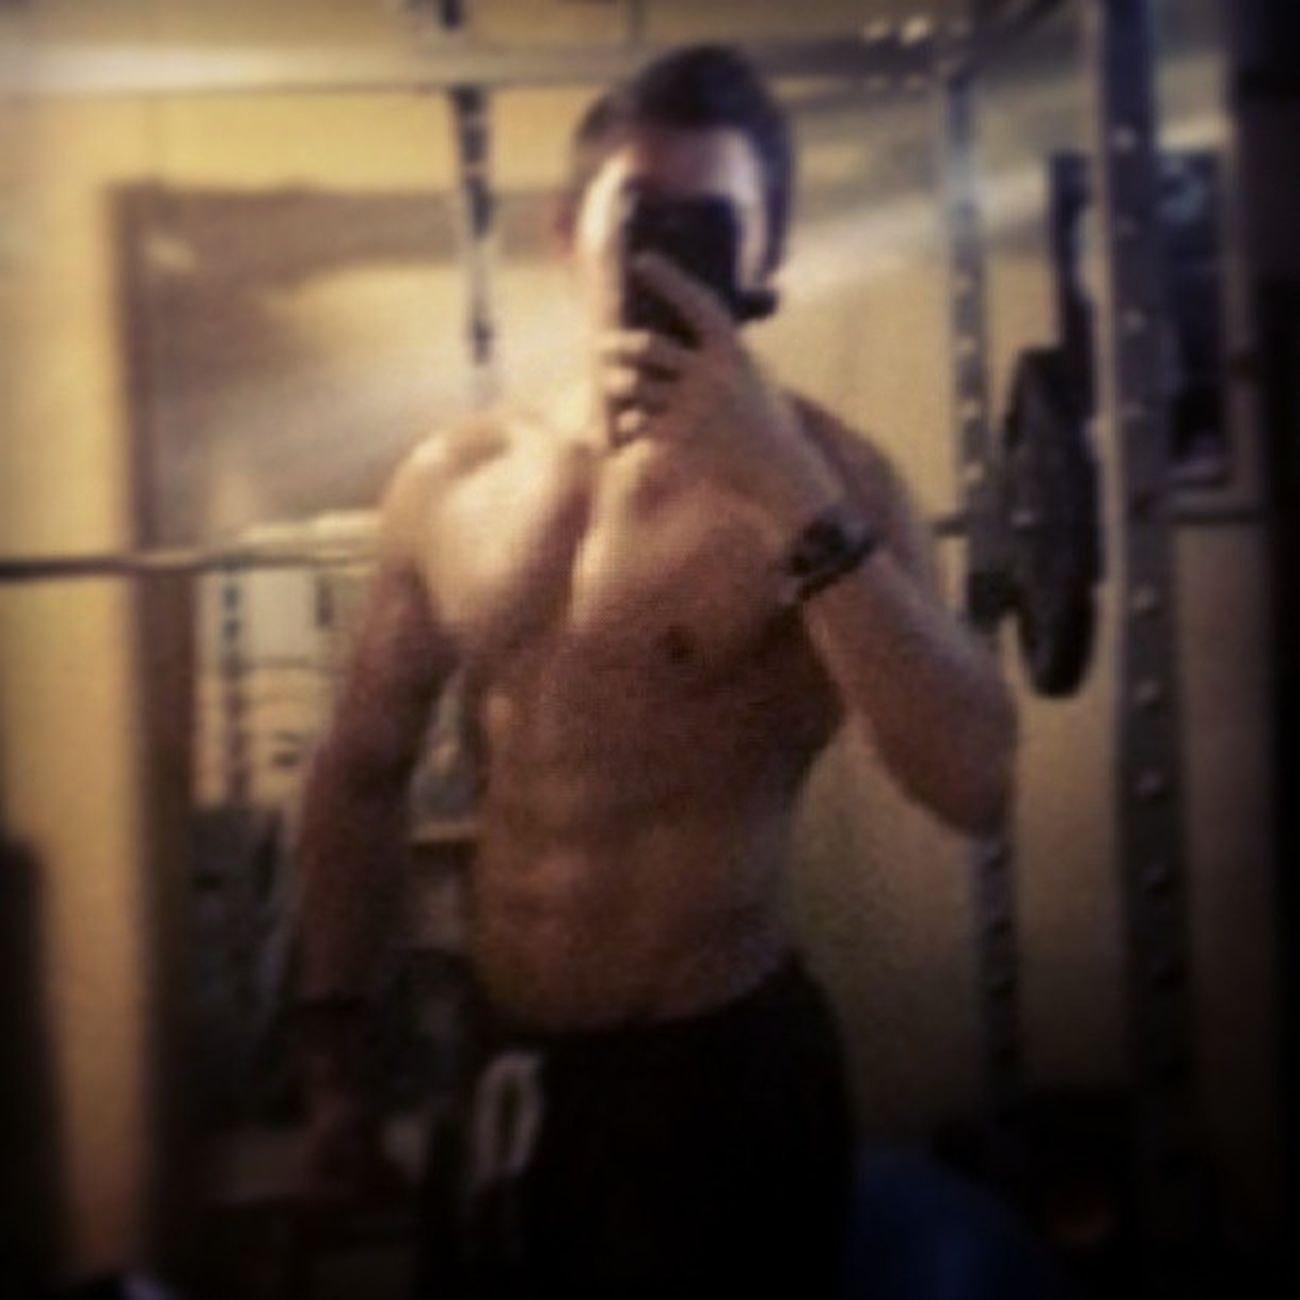 Blurry Selfie Gym Bored Keto Motivate  JustDoIt Thebeastden Filó Azn Halfcast Natty